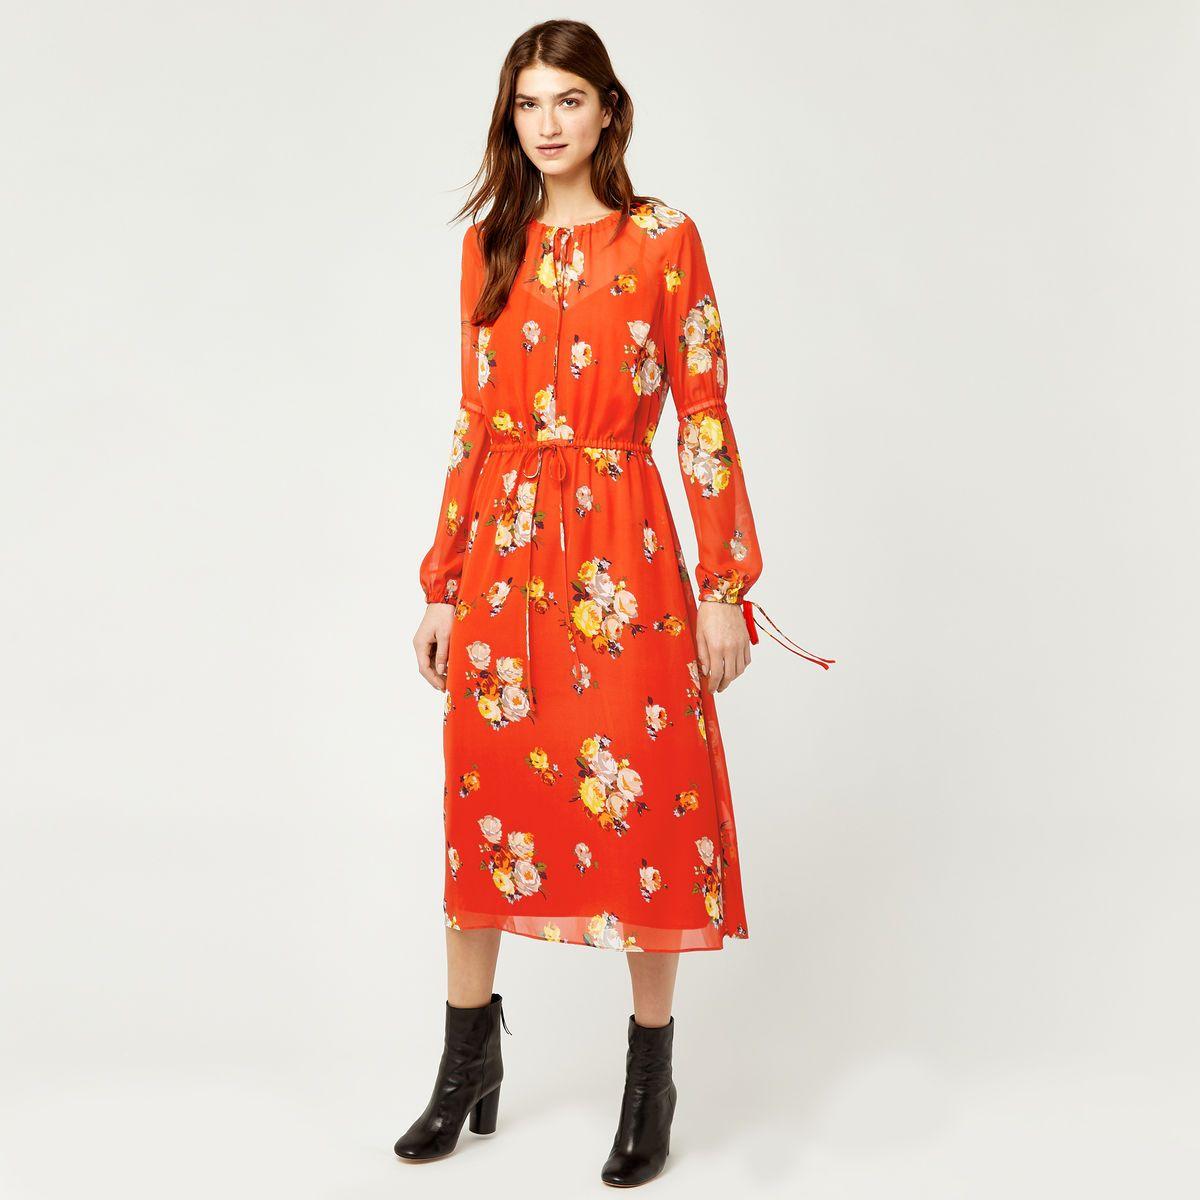 Womens Victoria Floral Chiffon Dress Warehouse 1xBR7Ukvx